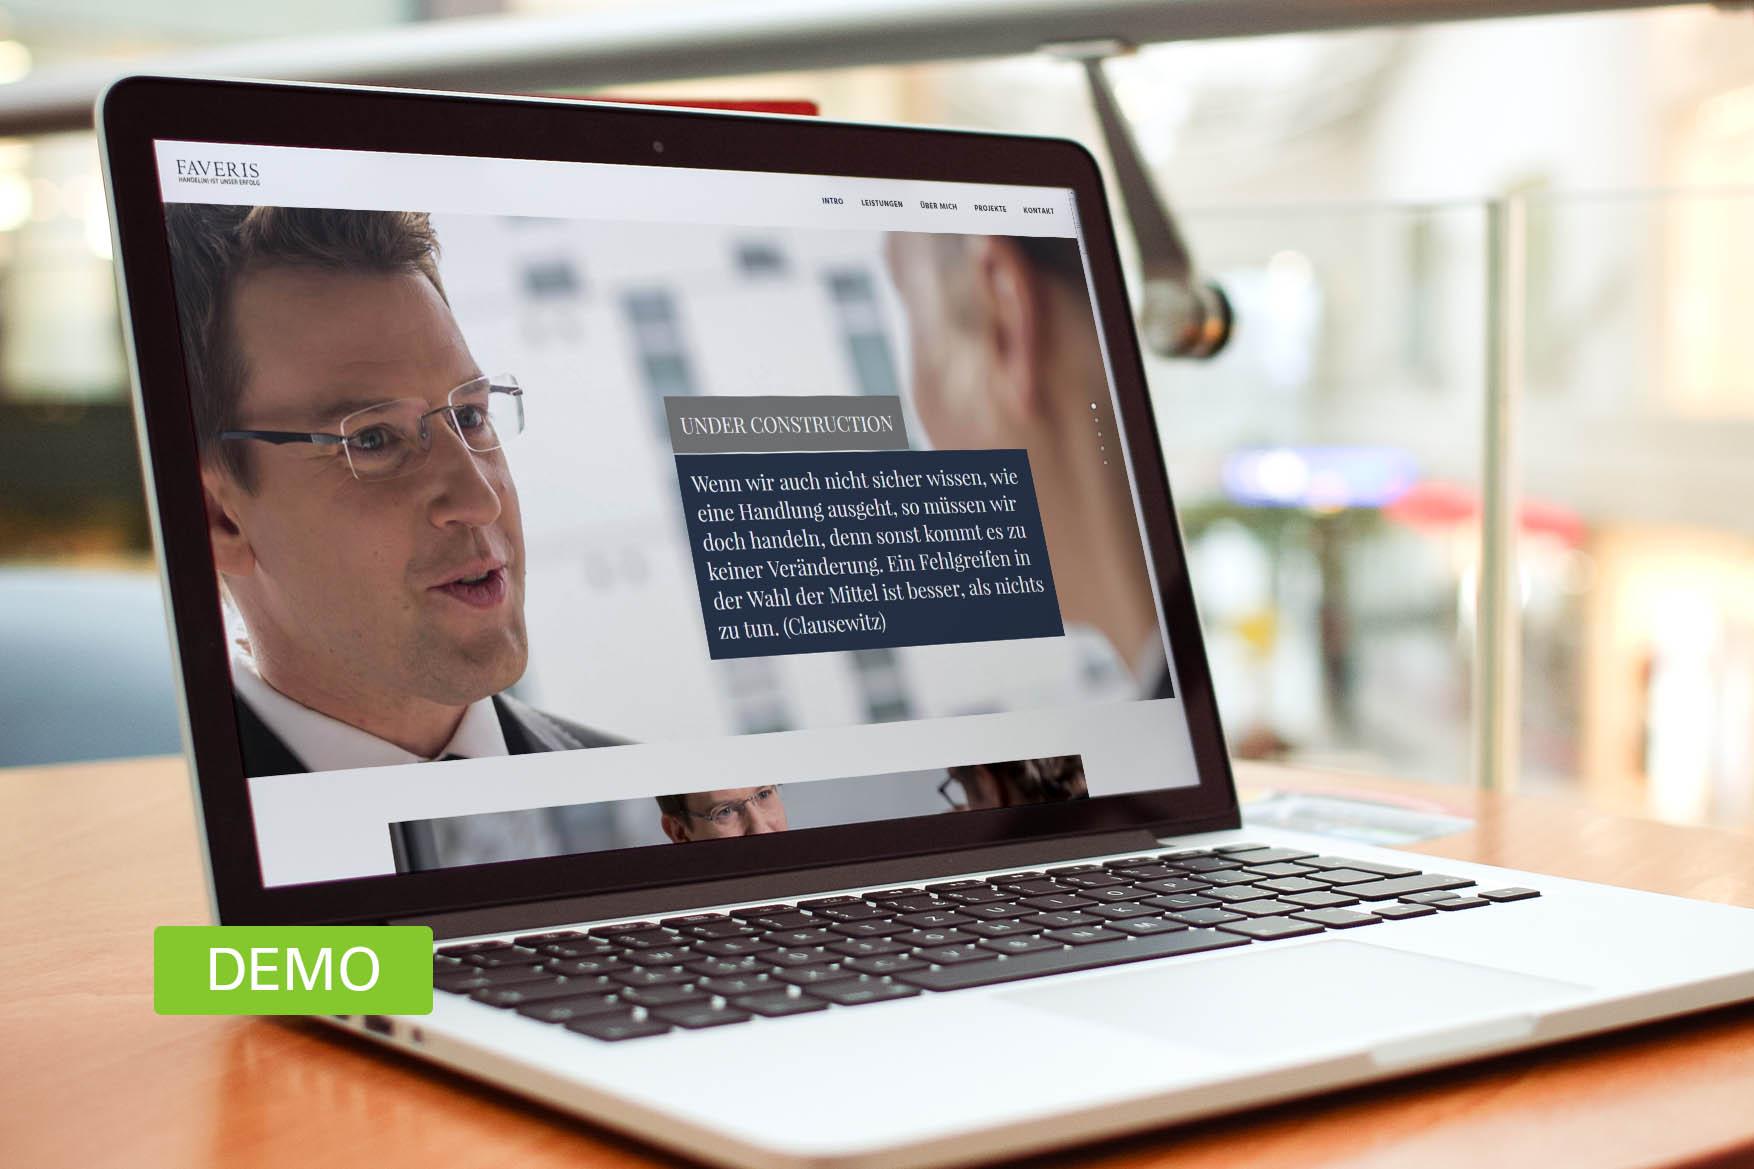 referenz-website-faveris